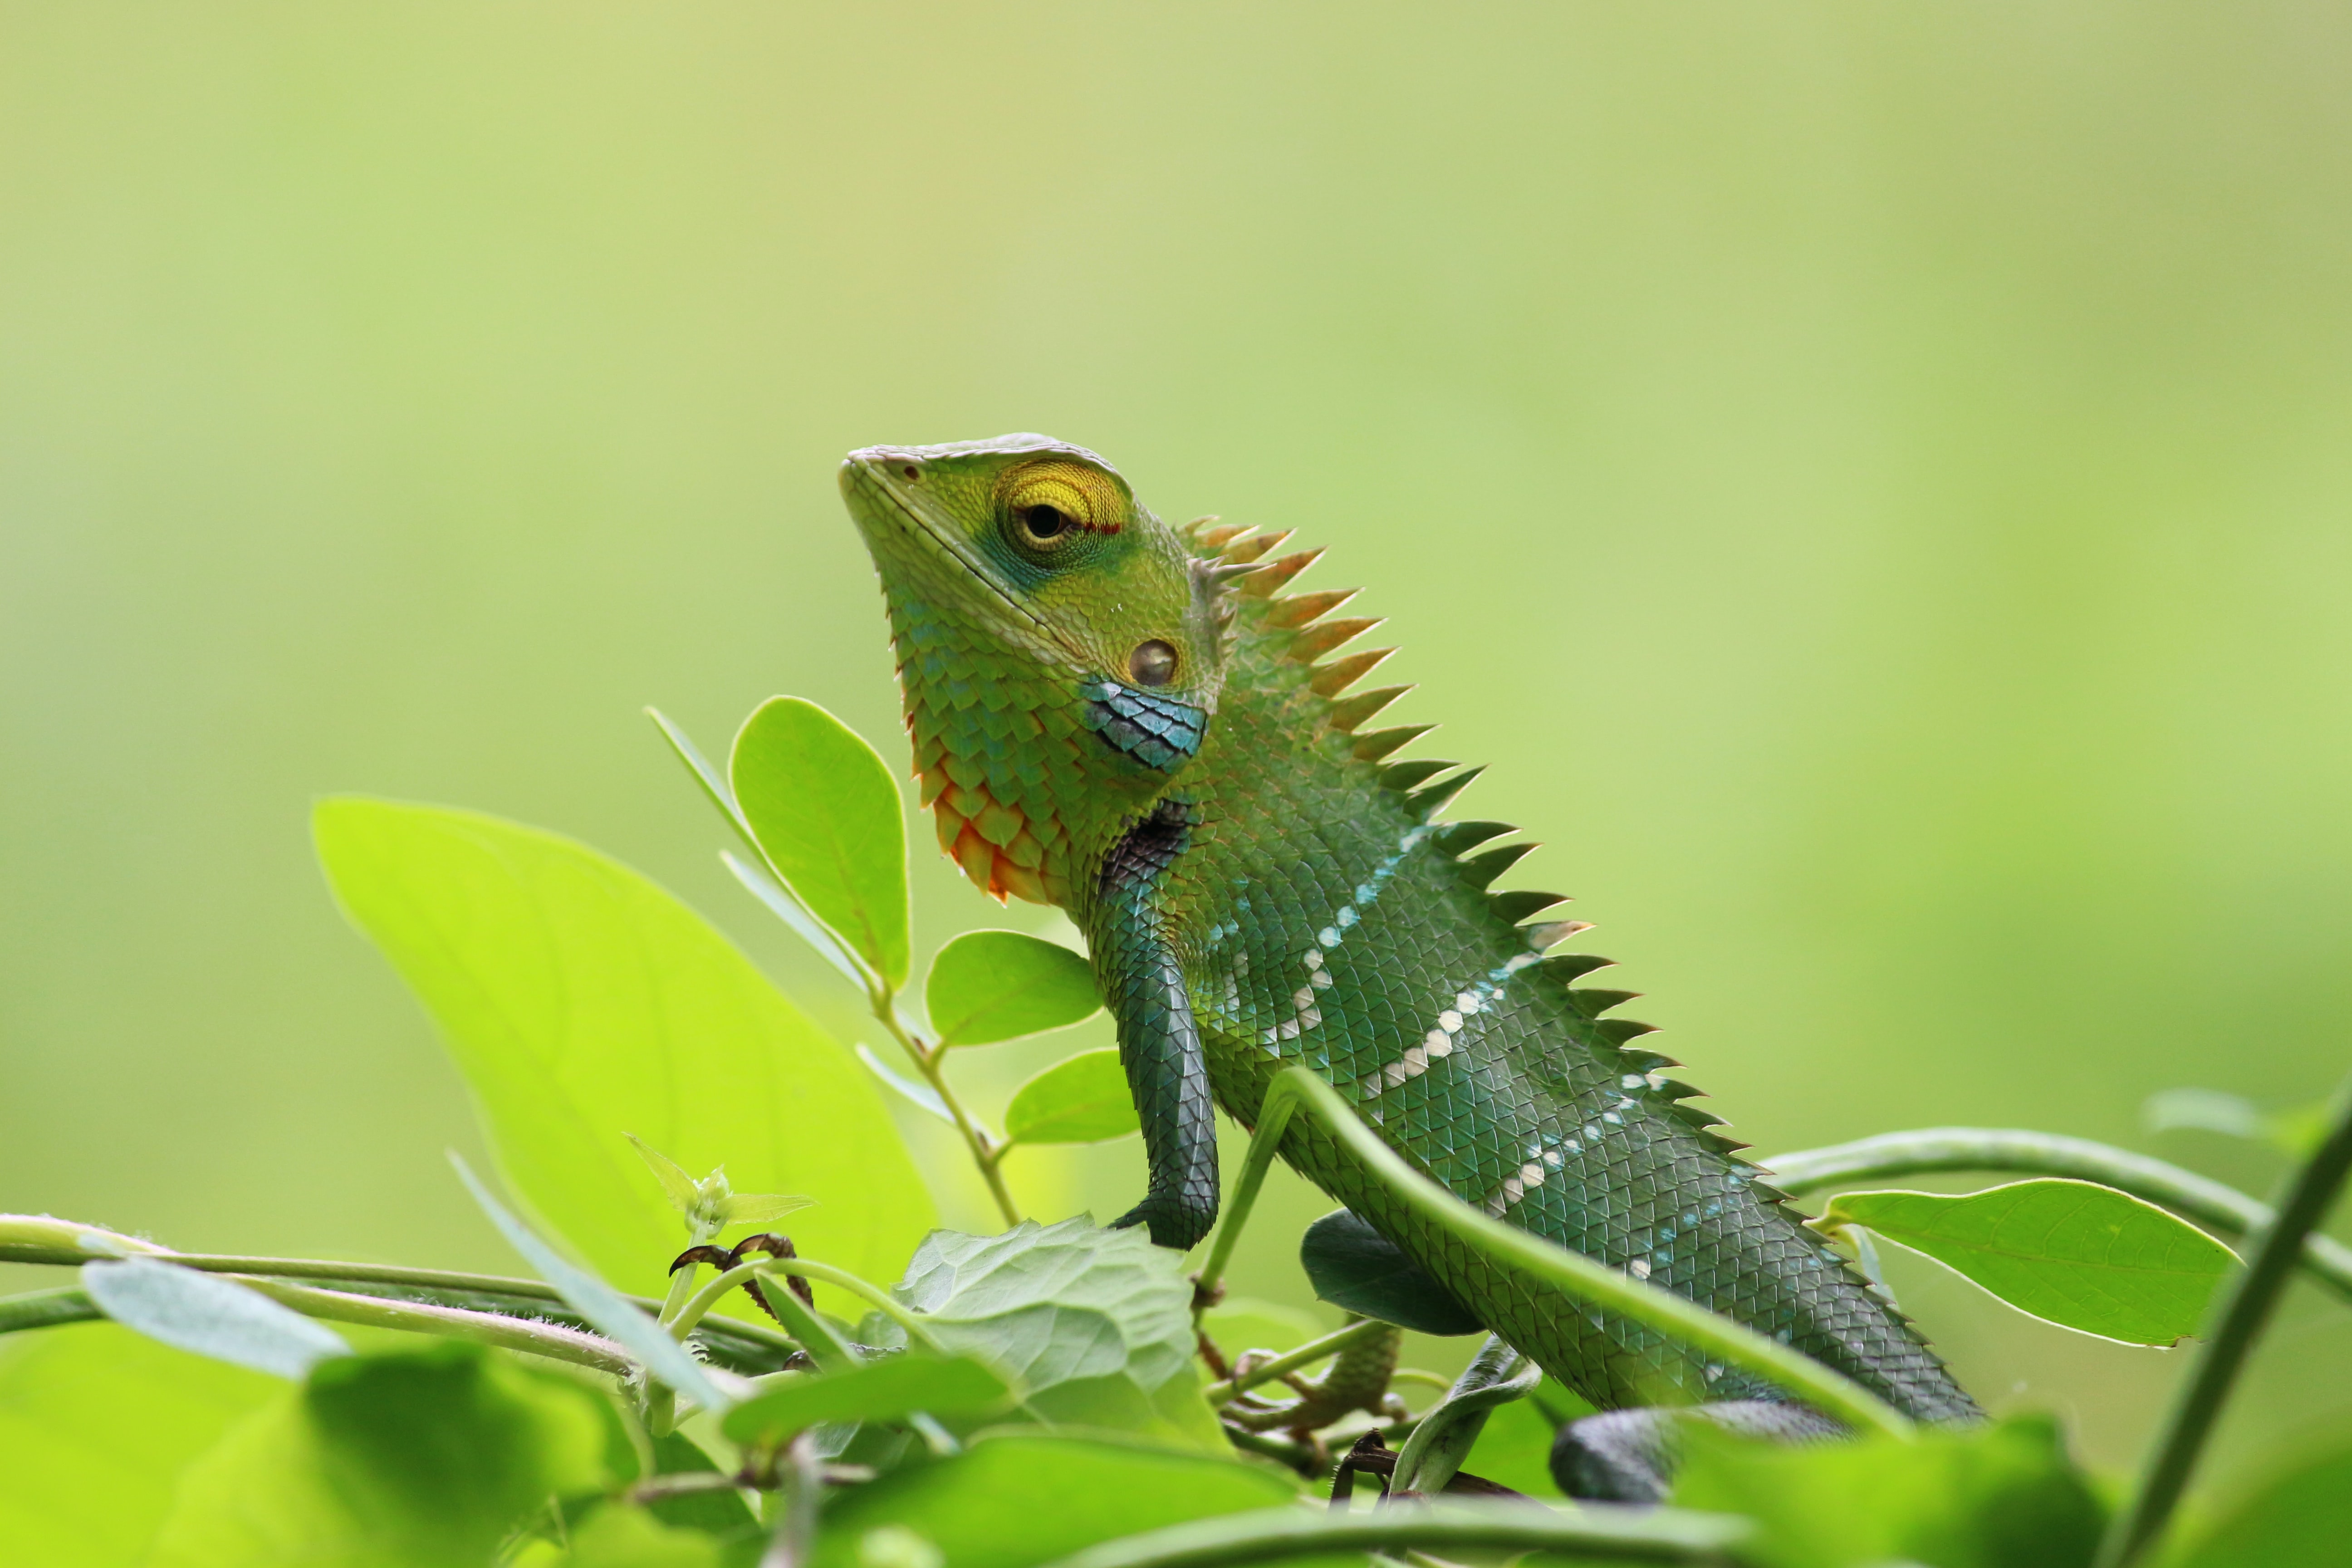 green iguana on green leaf